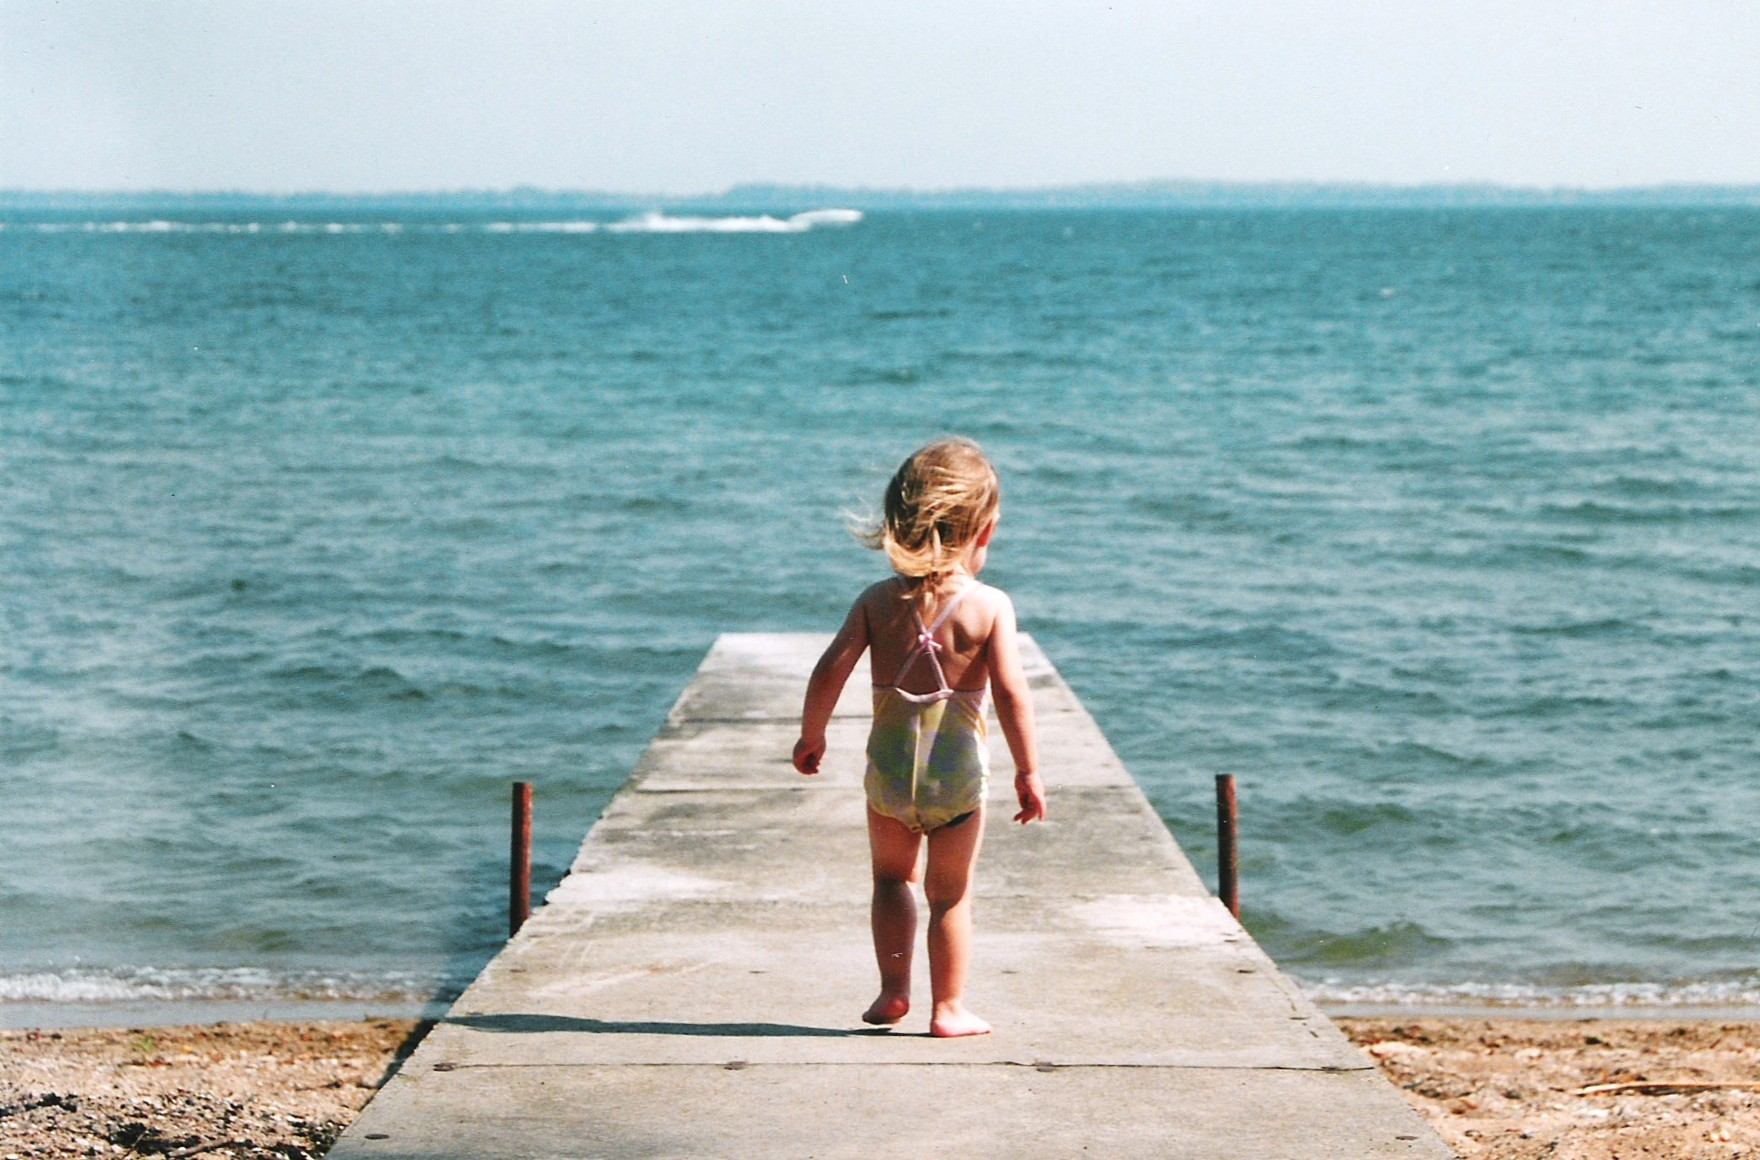 Lifeguarding, Children, Water safety